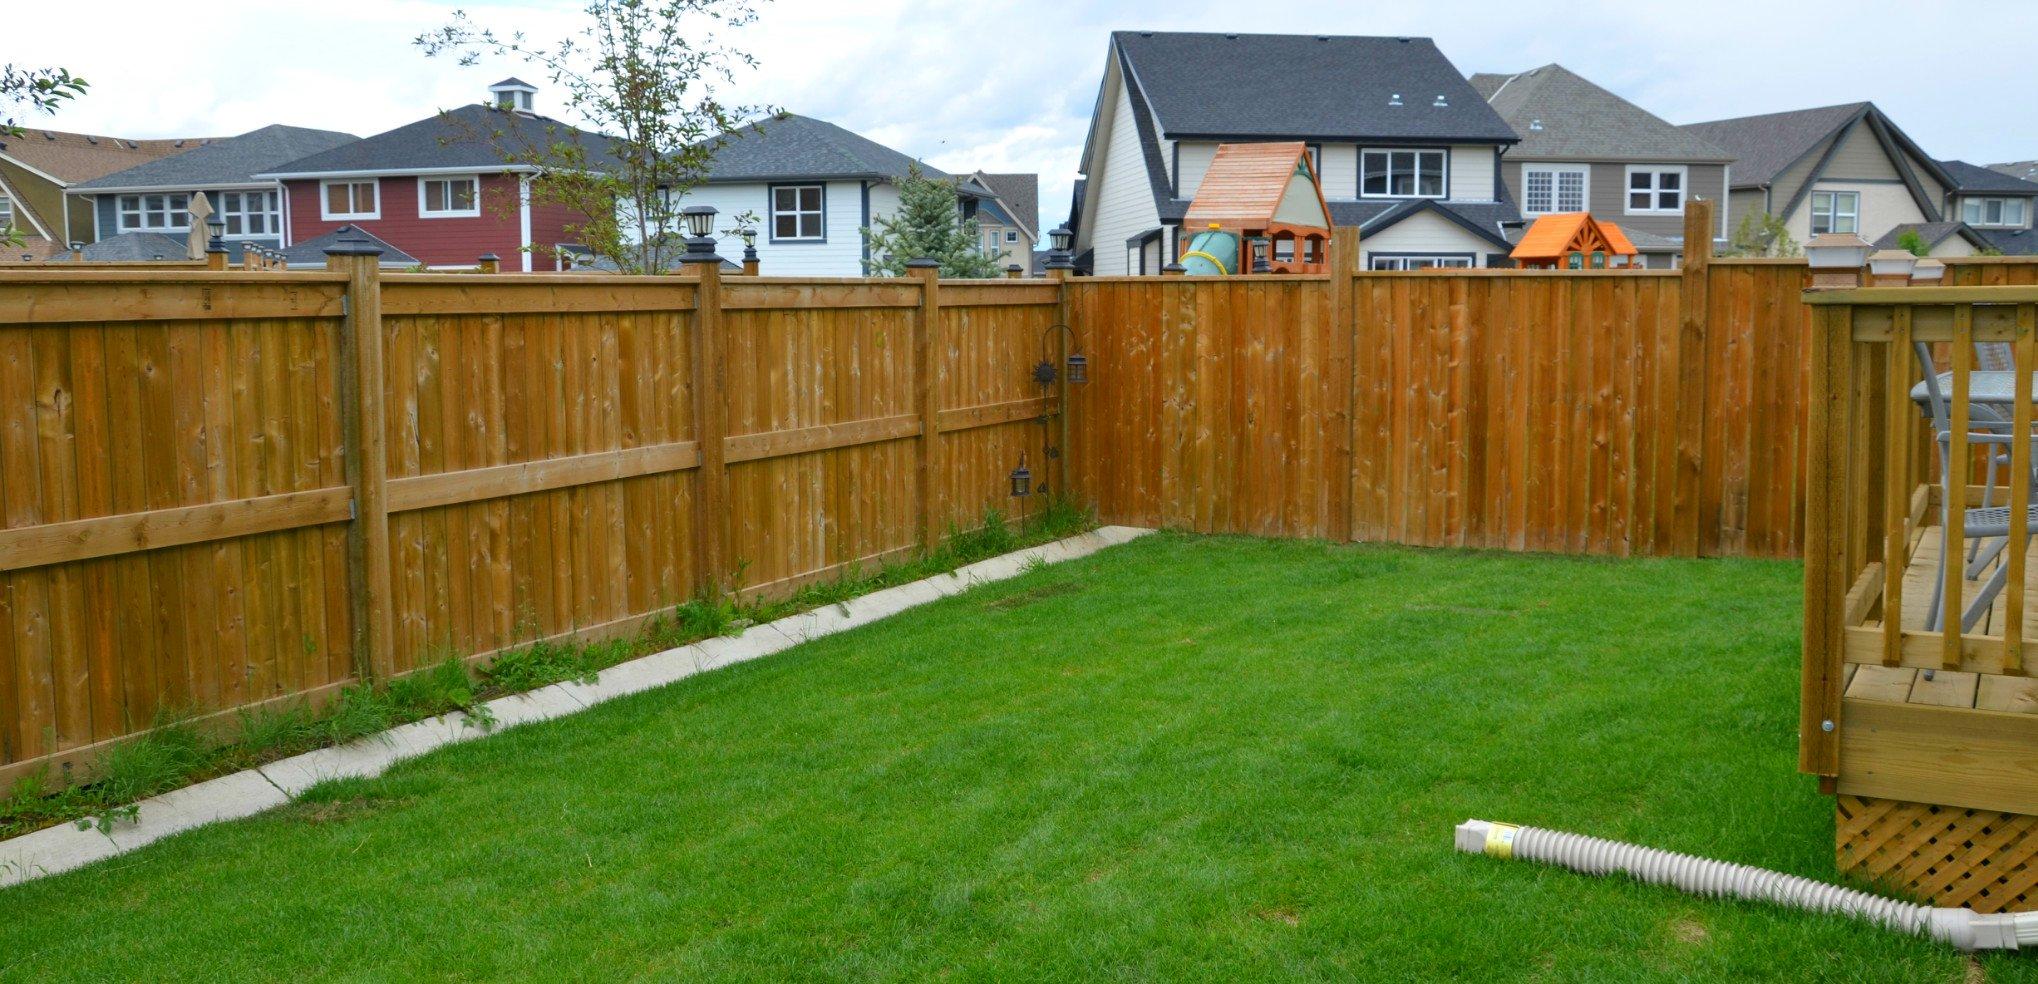 Fence Nice Simple Wood Fence Like The Dark Colour Fence P Nongzico